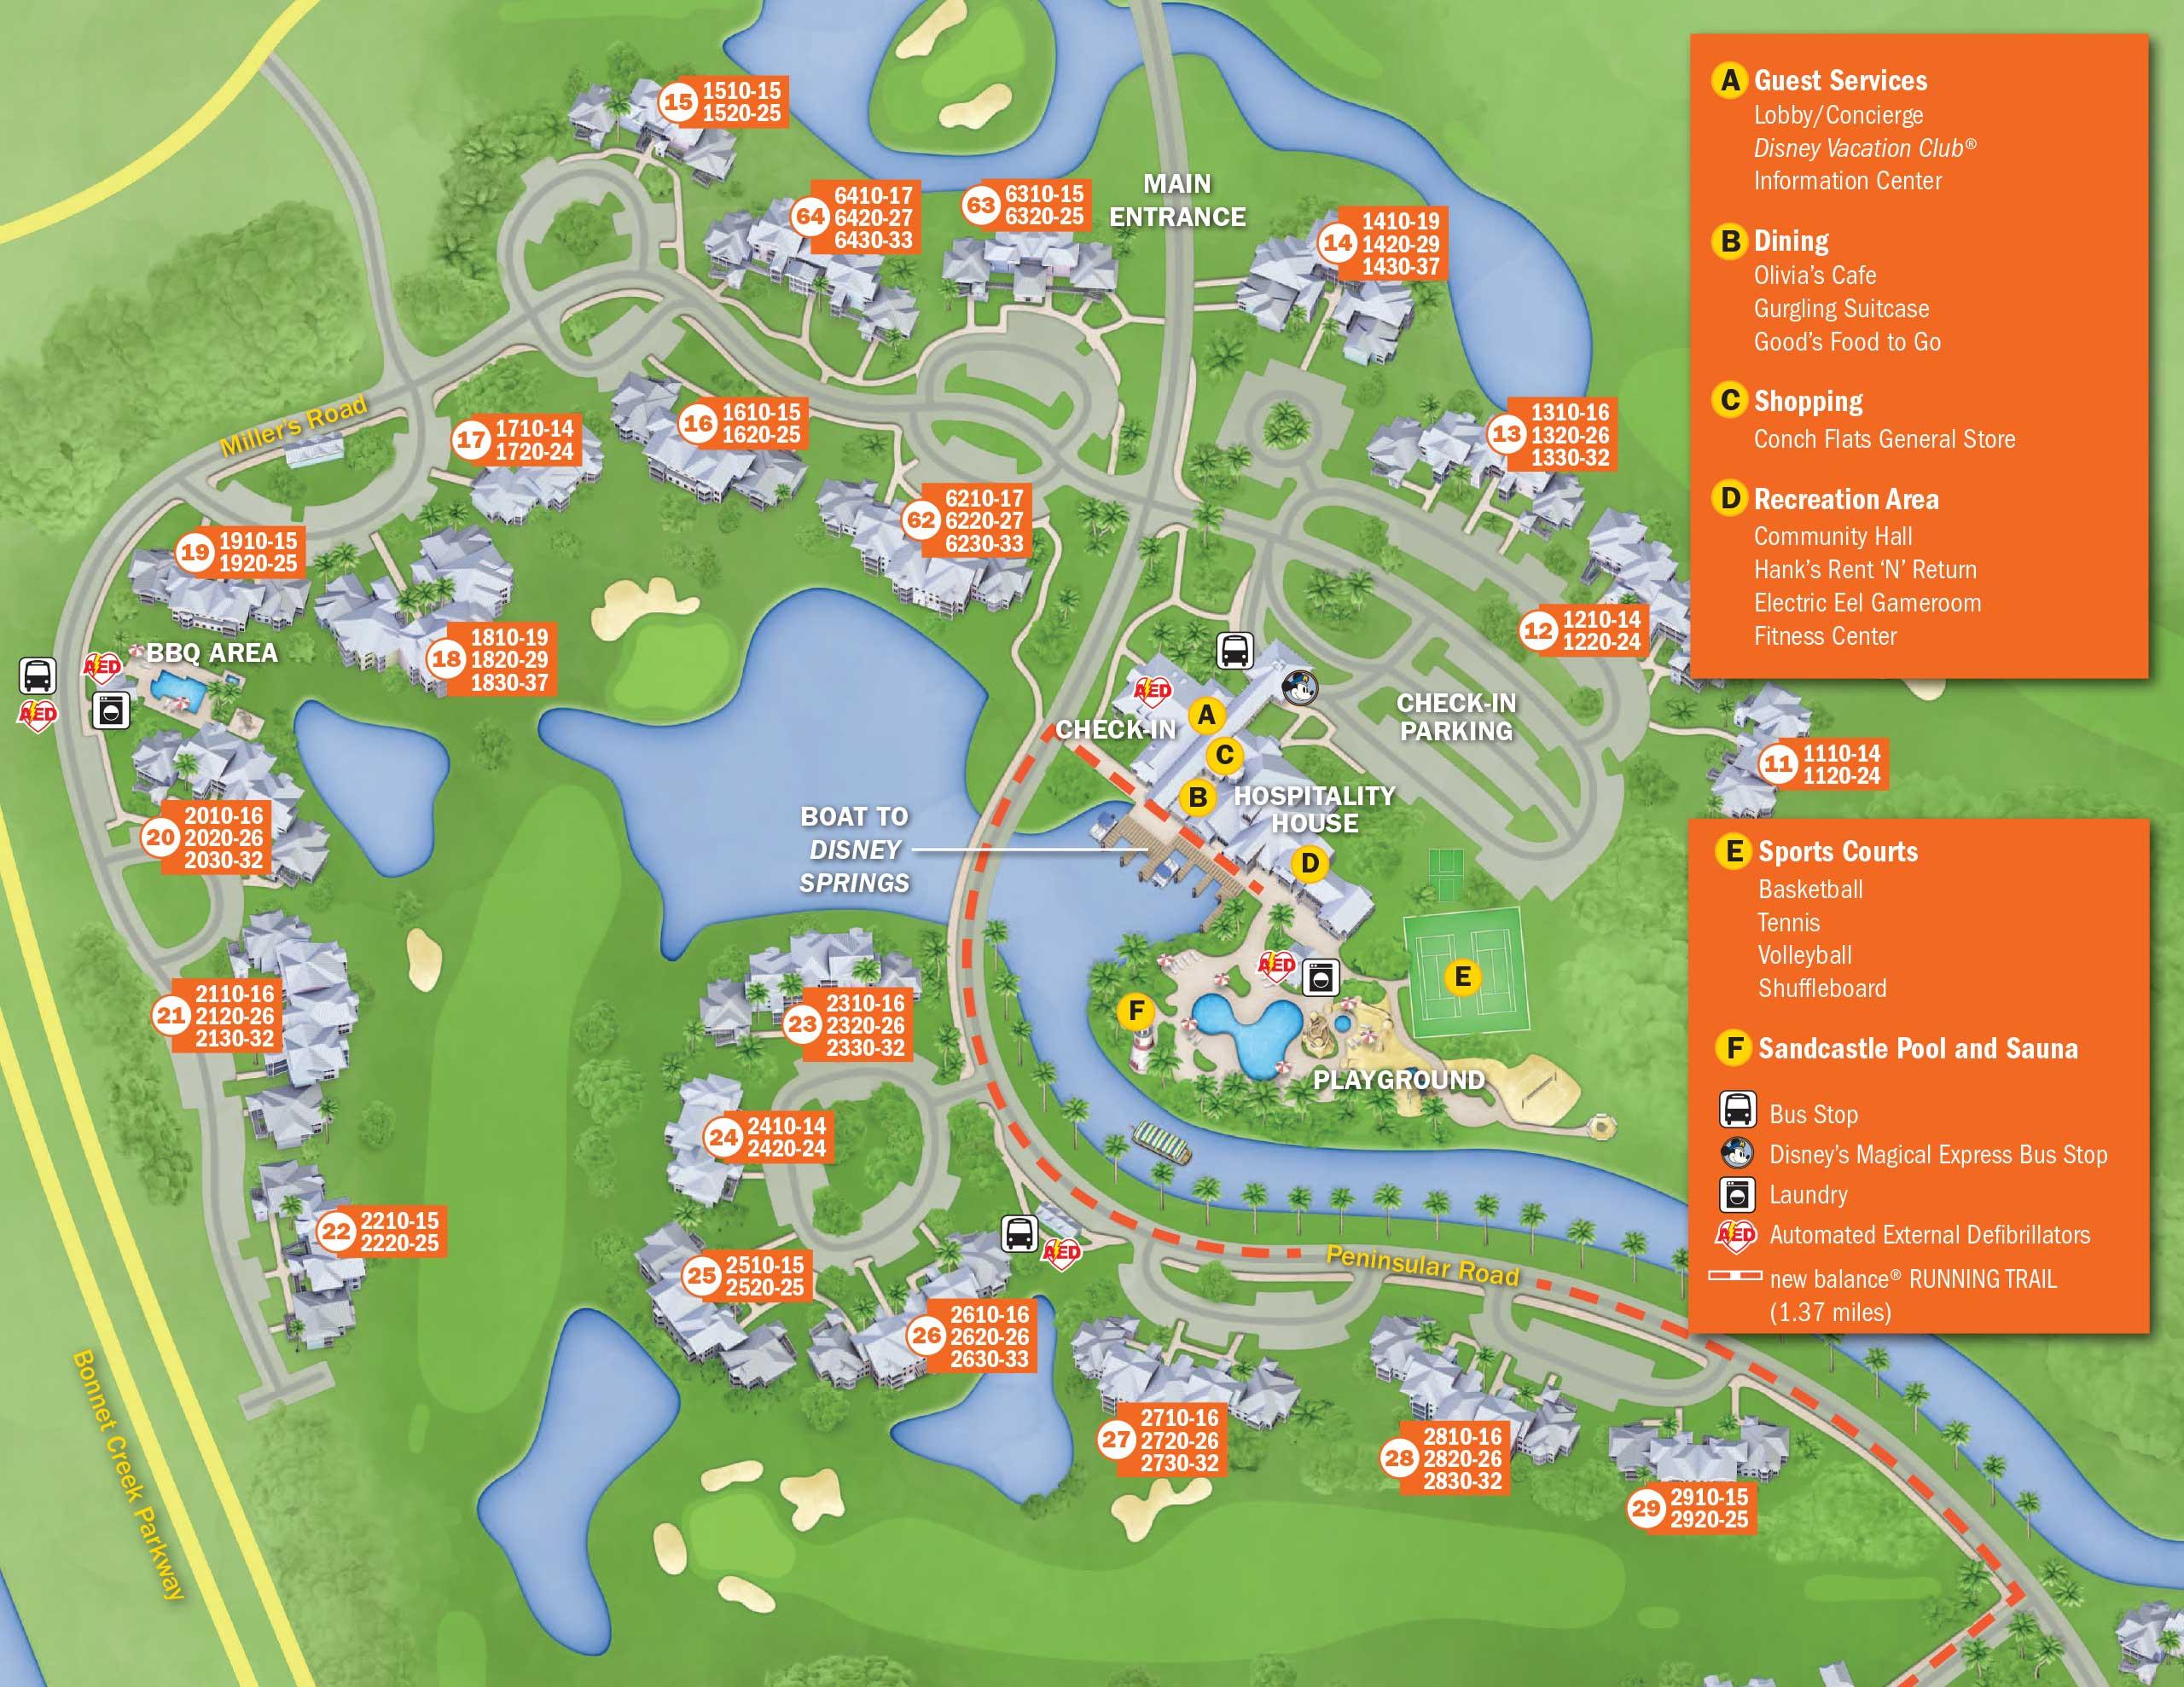 April 2017 Walt Disney World Resort Hotel Maps Photo 27 Of 33: Disney Springs Hotels Map At Slyspyder.com